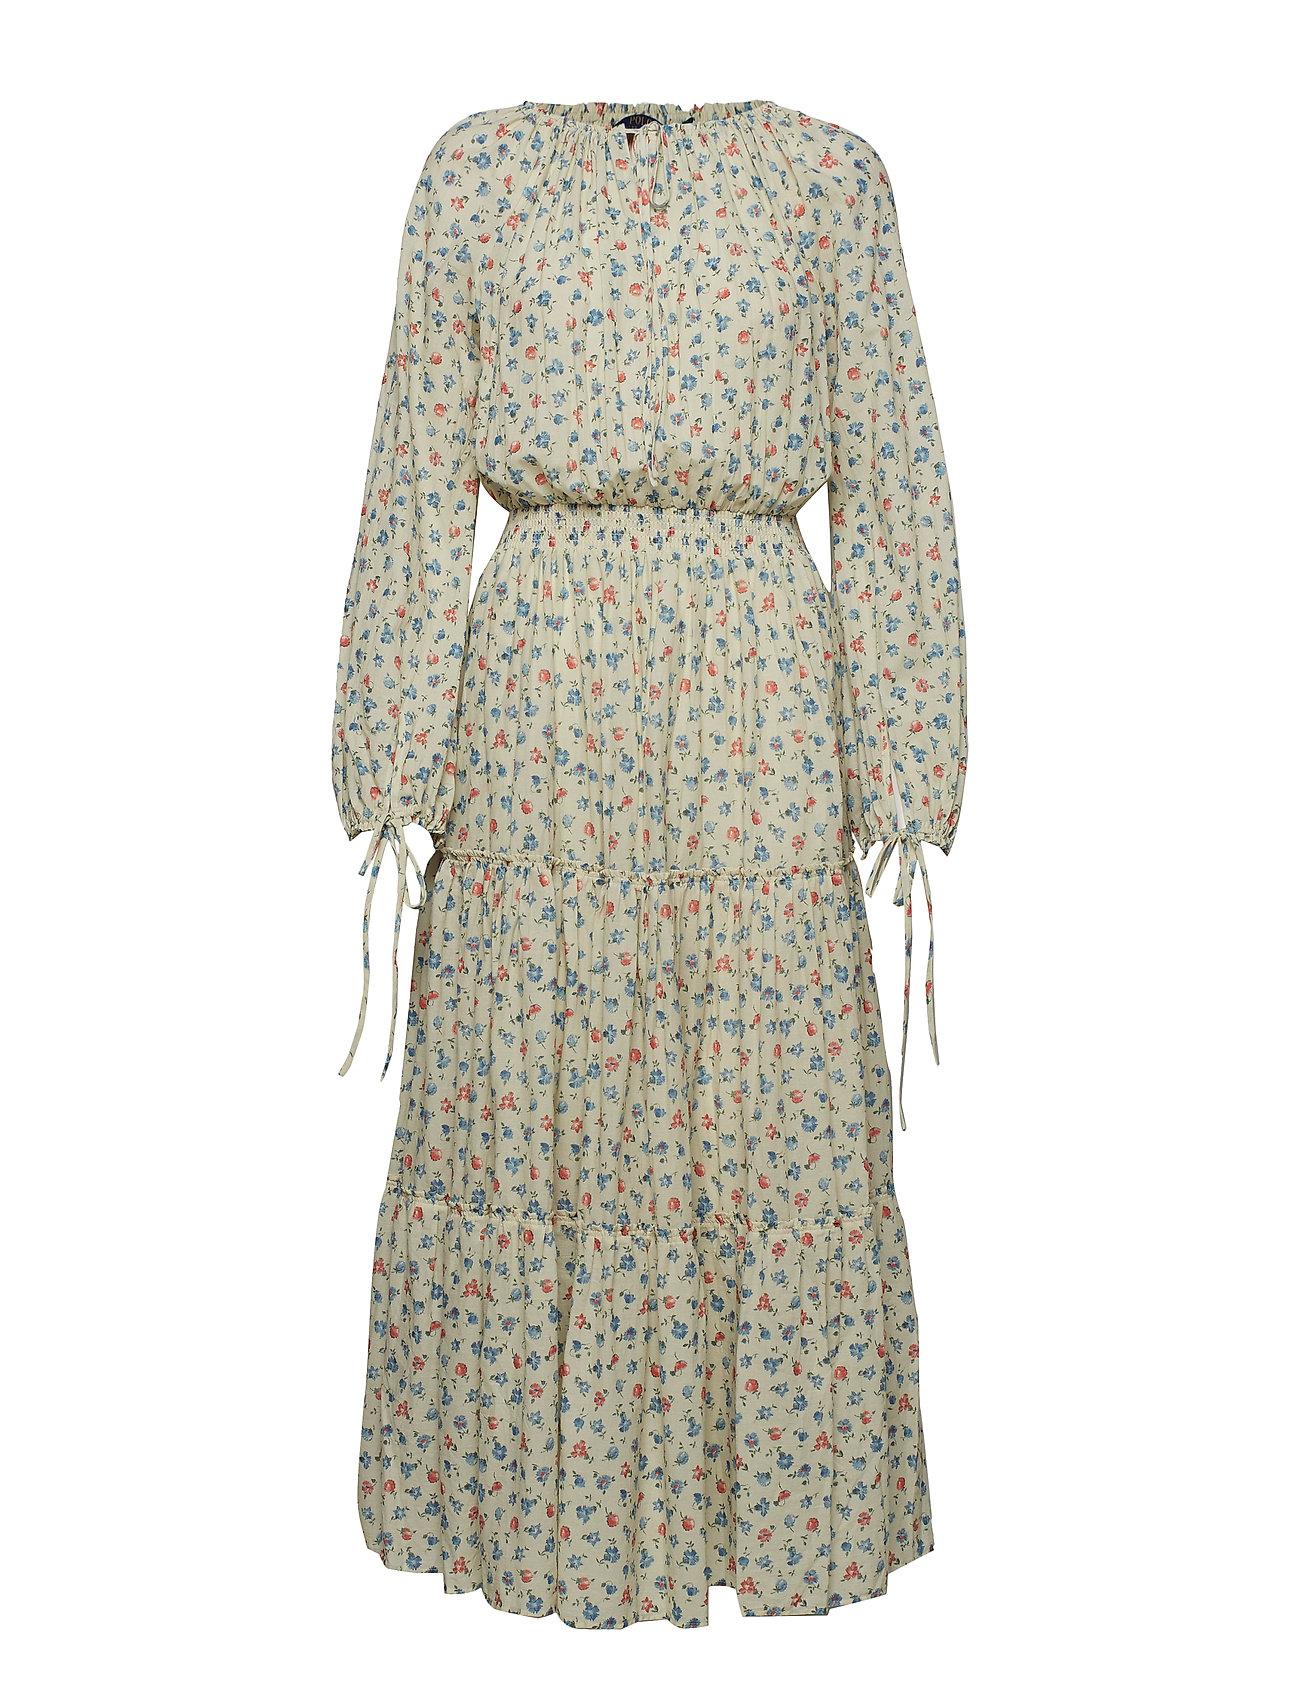 Polo Ralph Lauren Floral Gauze Dress - DITSY DAISY FLORA